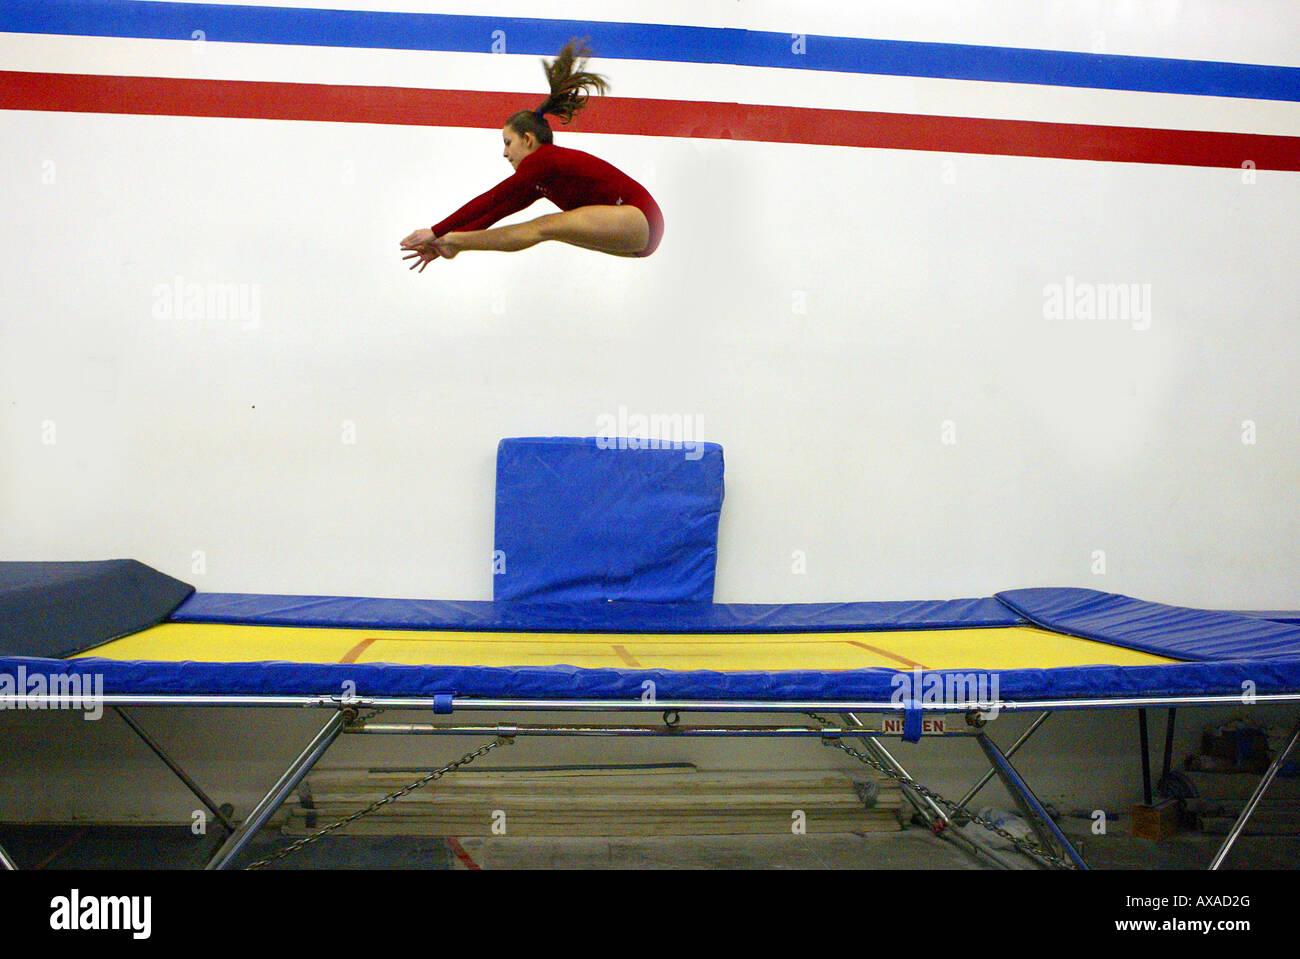 Teen Girl Performs On Trampoline In Gymnastics Center